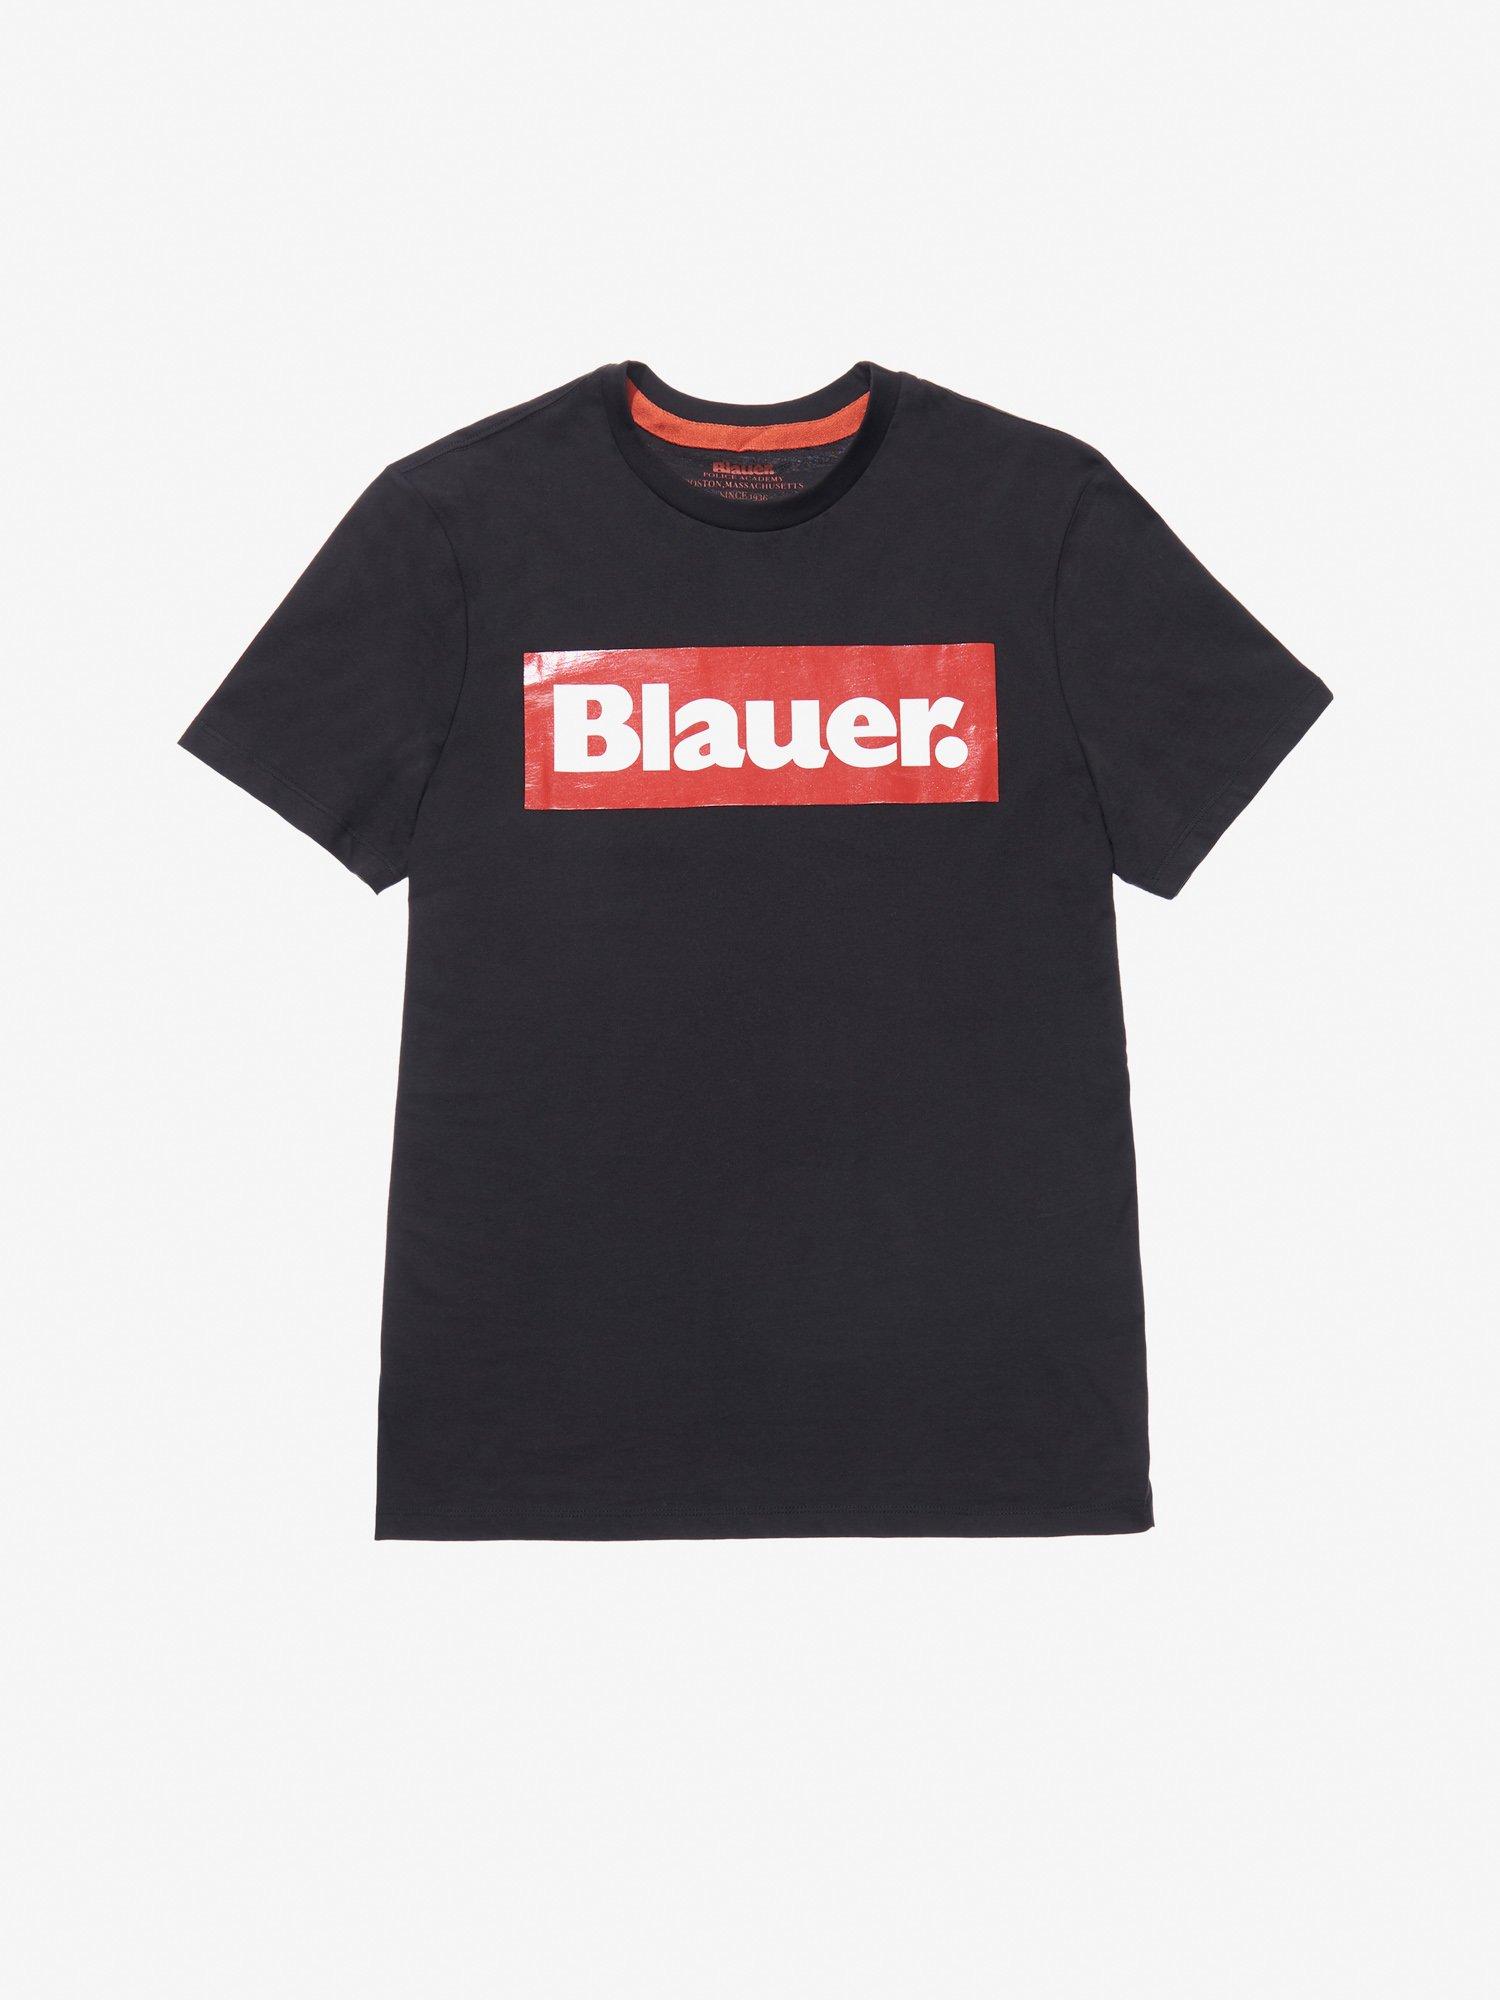 Blauer - BLAUER RECTANGULAR PRINT T-SHIRT - Black - Blauer